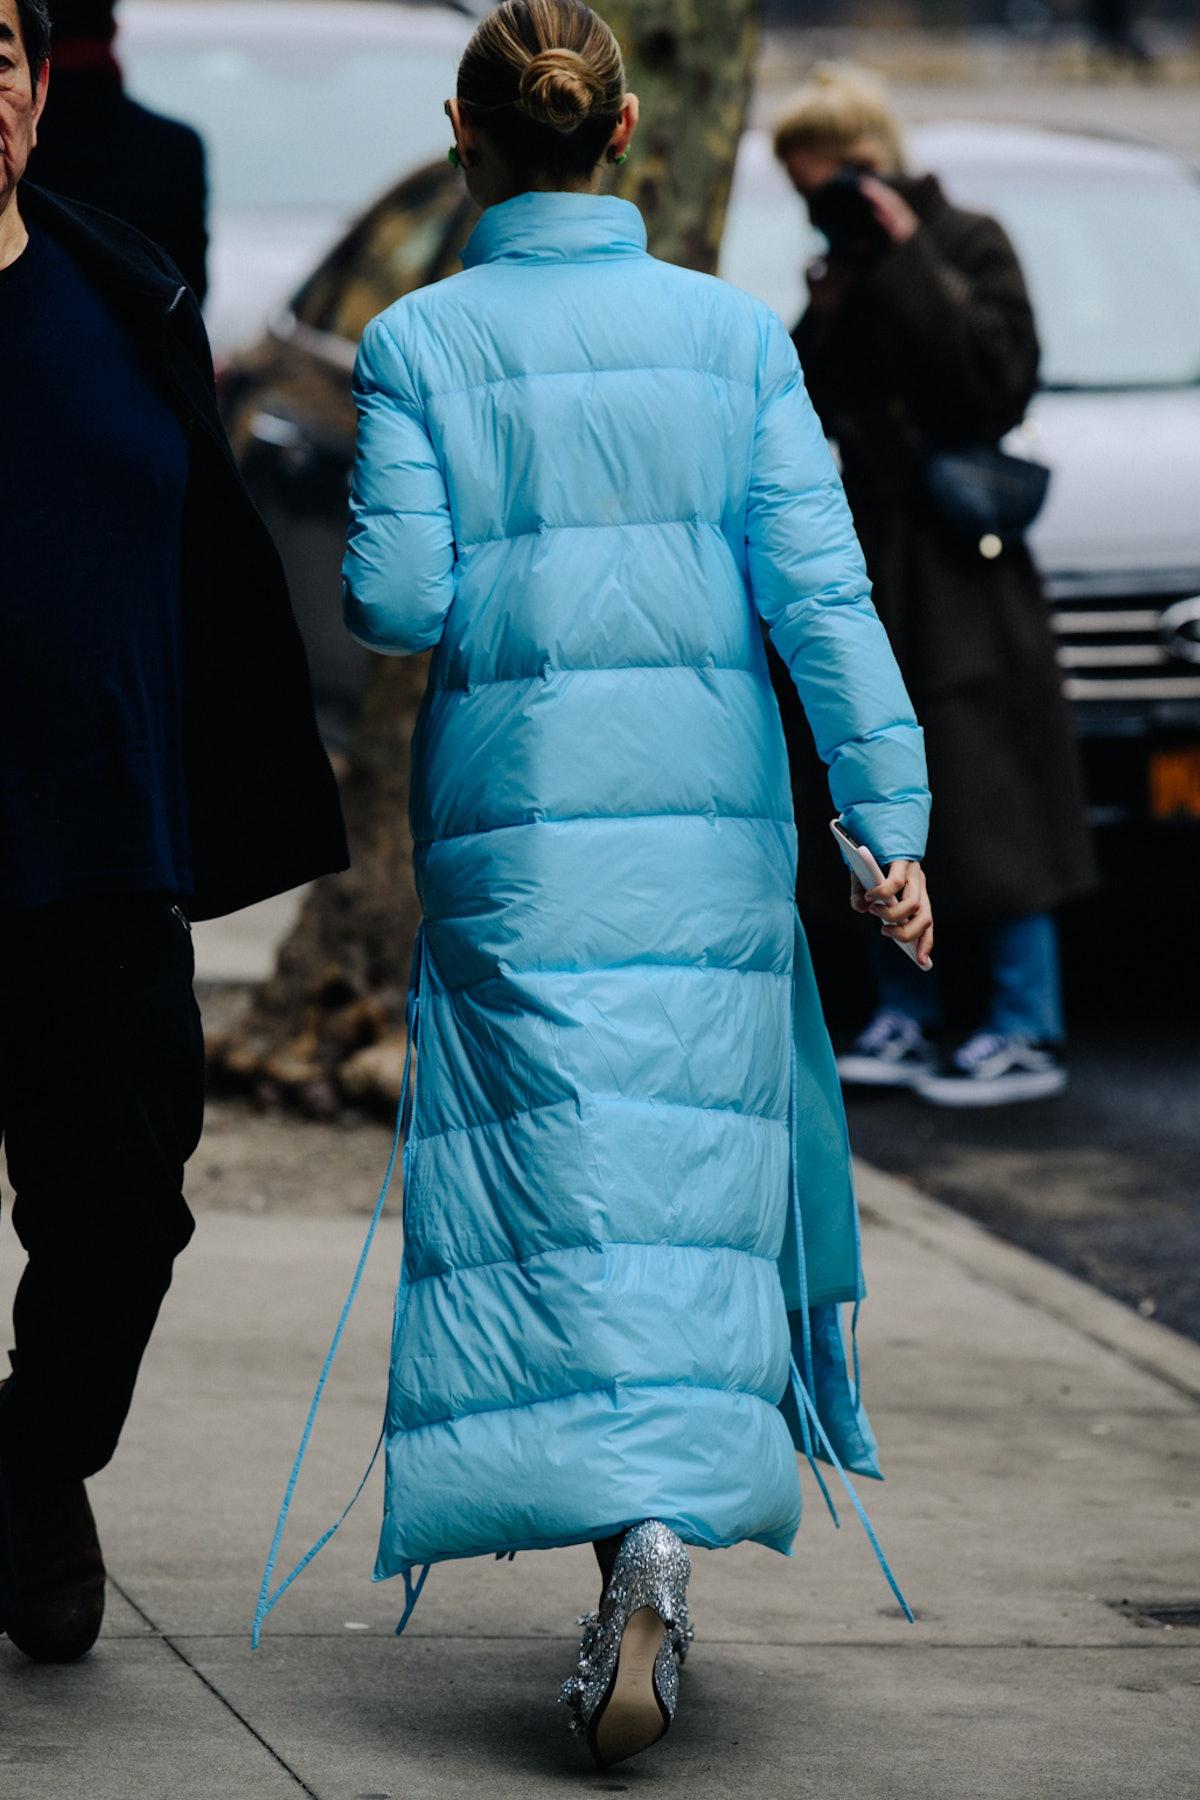 Adam-Katz-Sinding-W-Magazine-New-York-Fashion-Week-Fall-Winter-2019_AKS6124.jpg